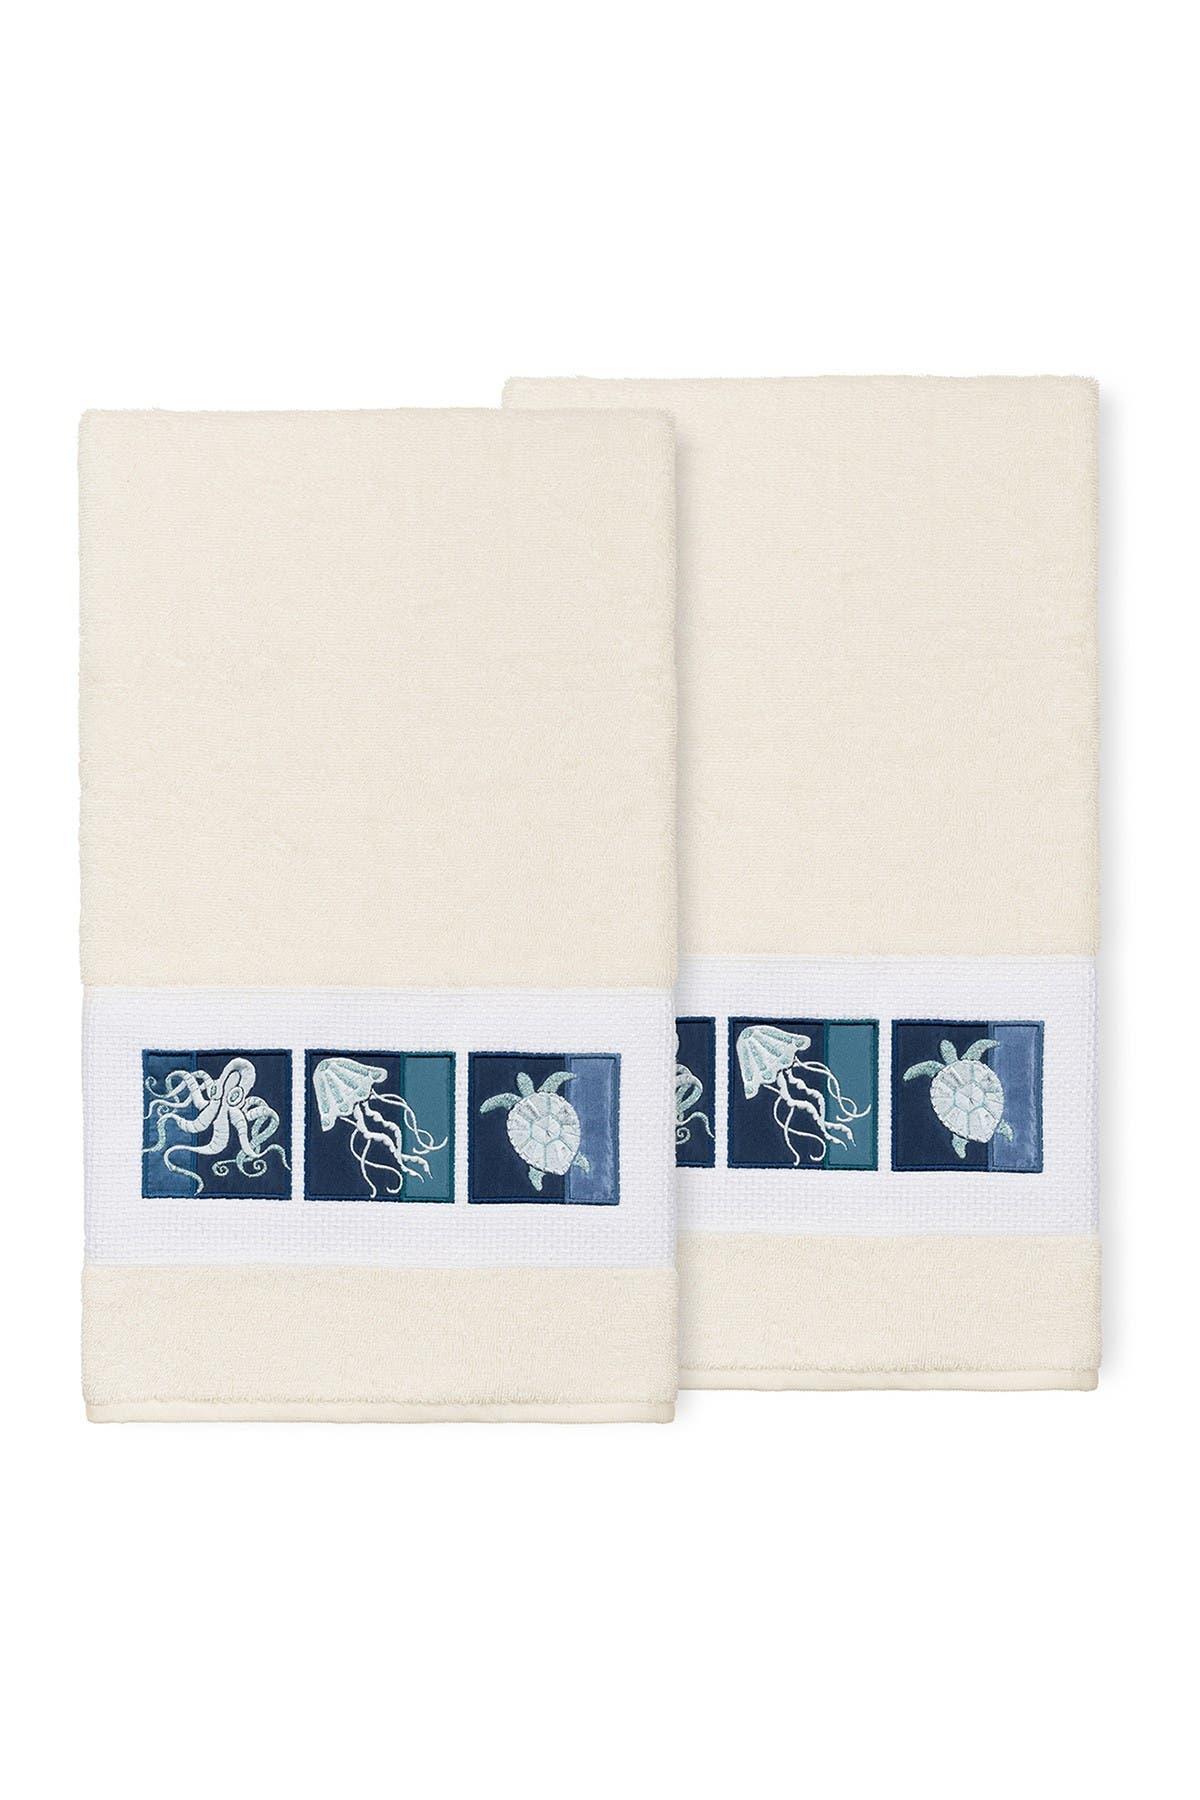 Image of LINUM HOME Ava Embellished Bath Towel - Set of 2 - Cream